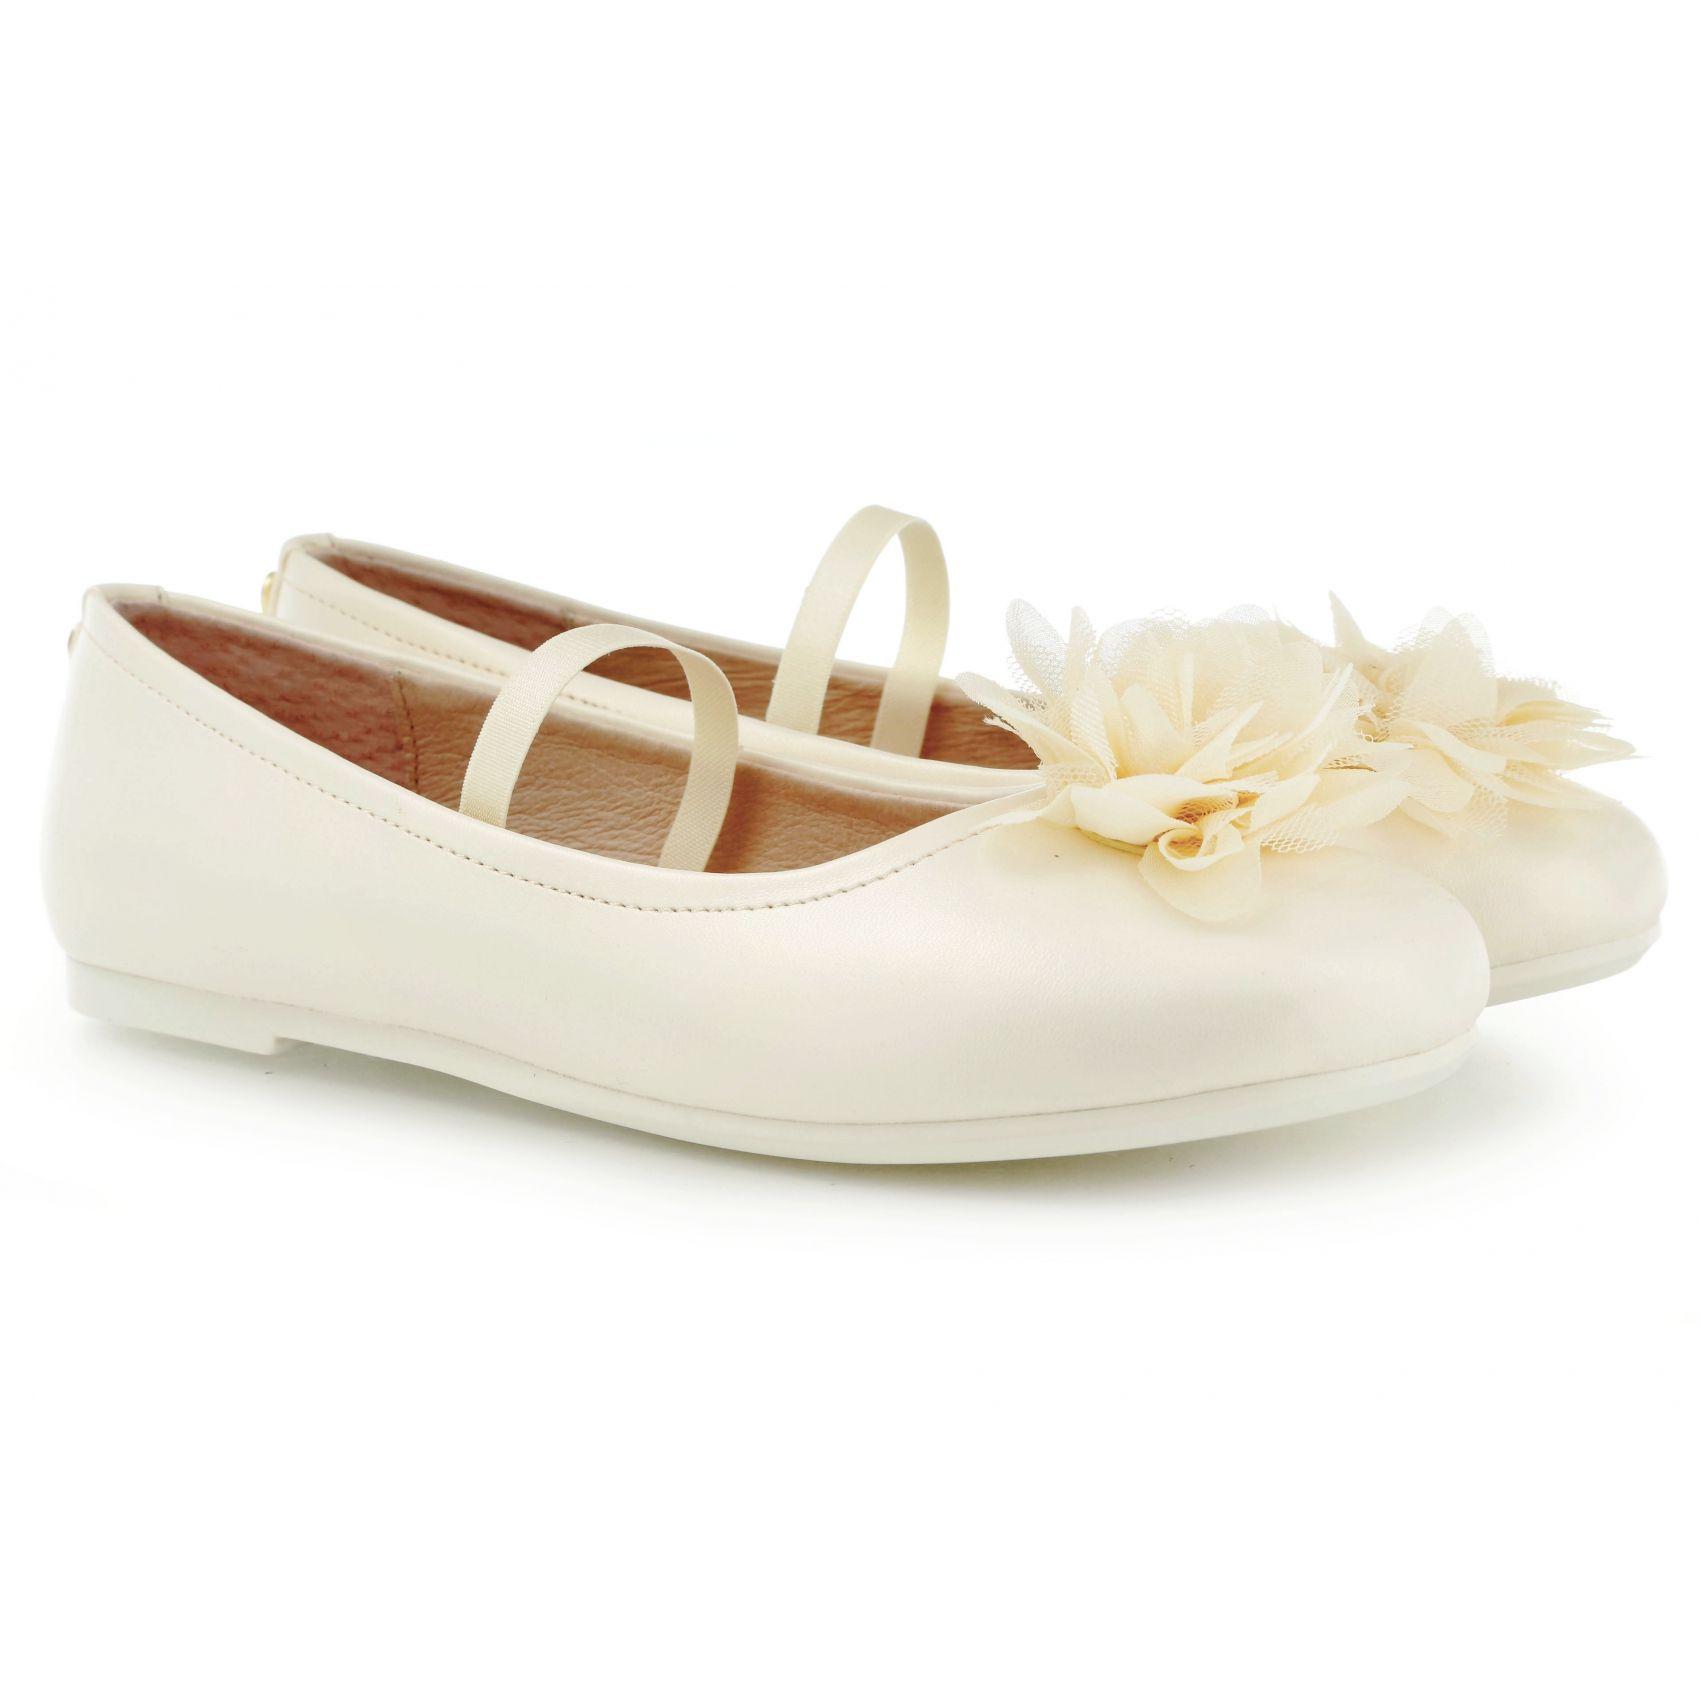 Perlowe Balerinki Mayoral Nacar 45 615 45 615 Shoes Flats Fashion